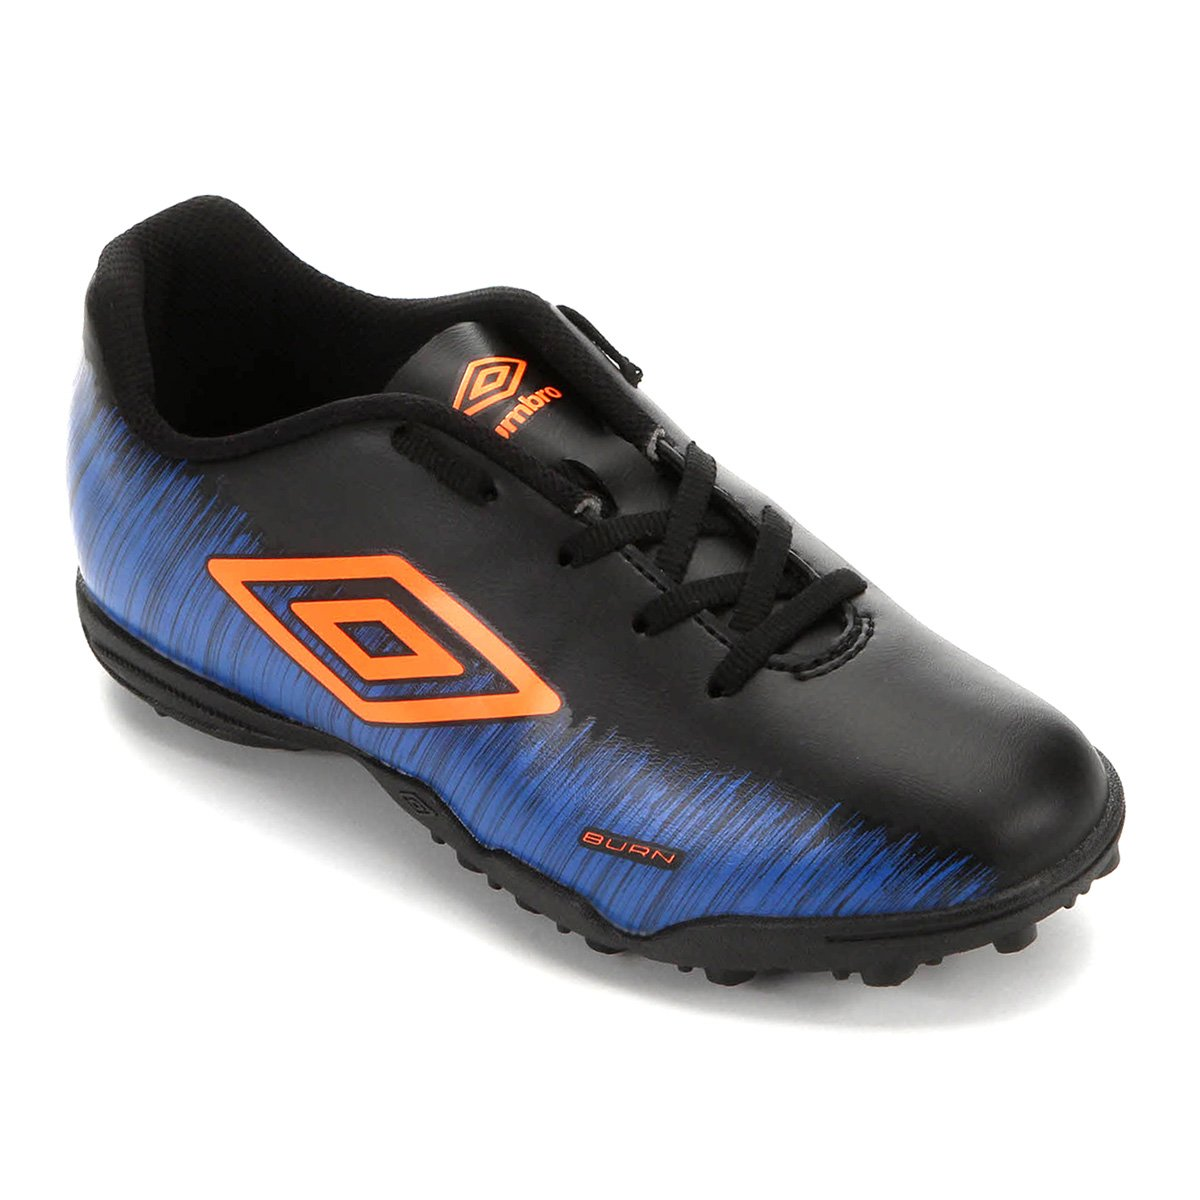 Chuteira Umbro Society Soccer Shoes Burn